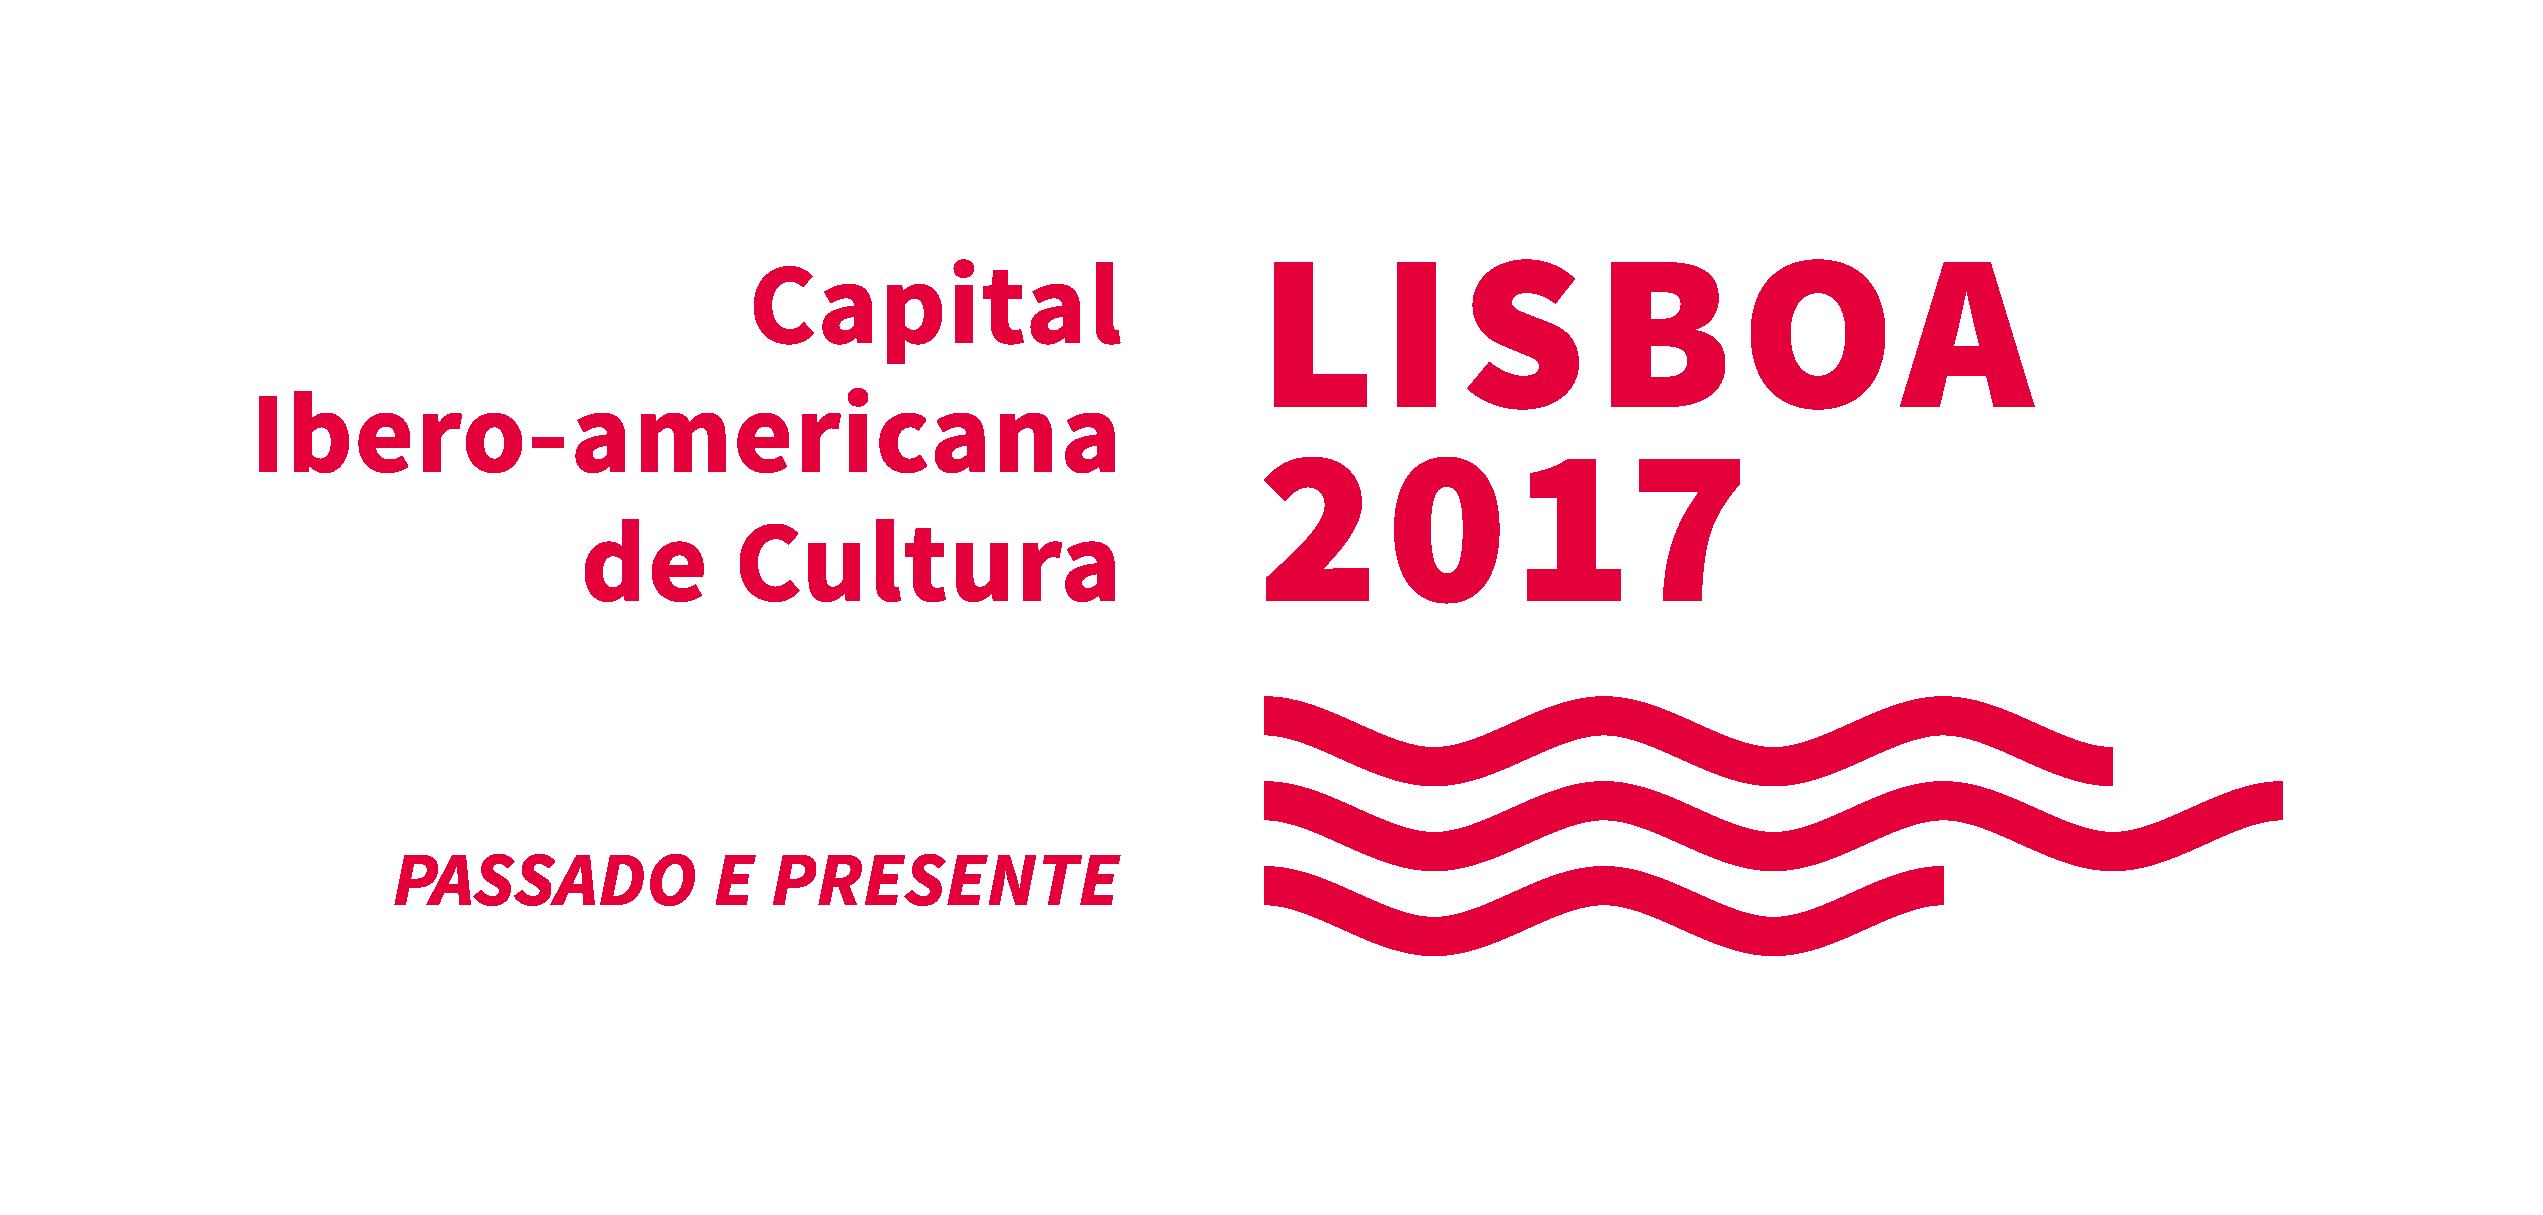 Lisboa 2017 PP Hori RGB Red